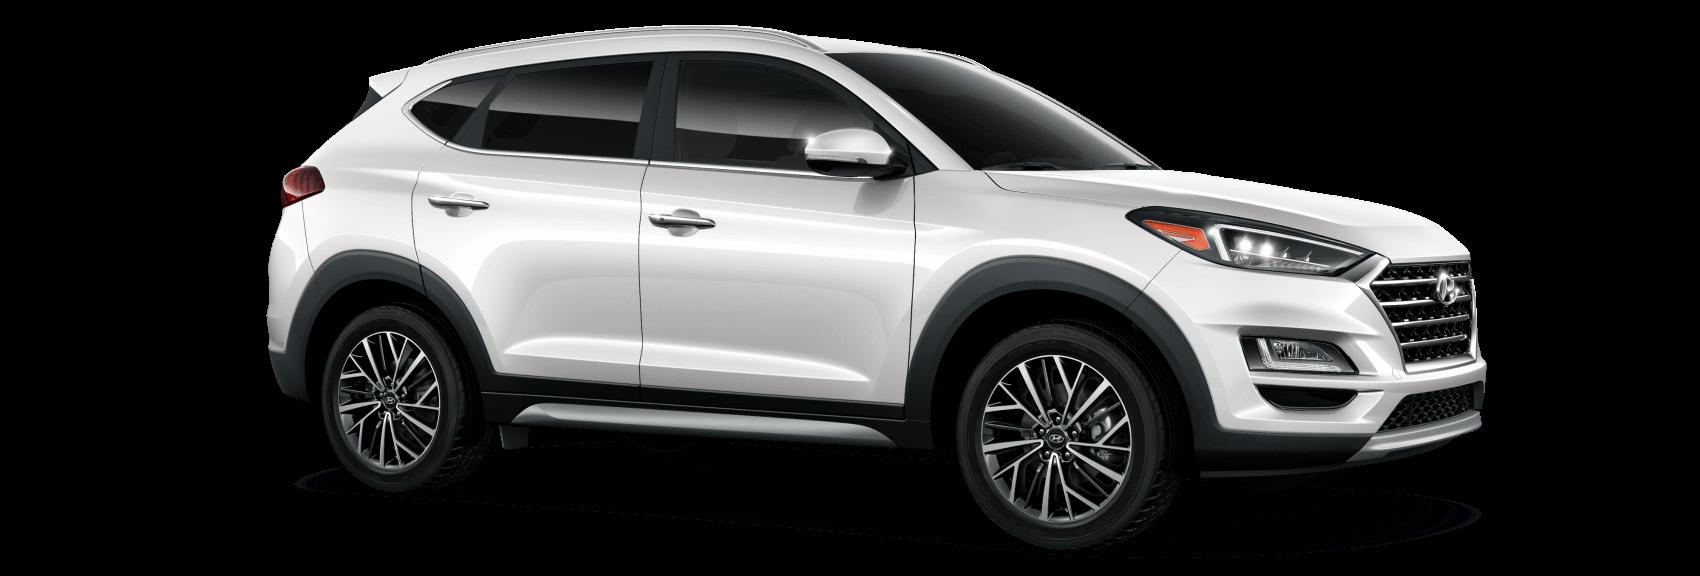 2021 Hyundai Tucson White Dublin OH